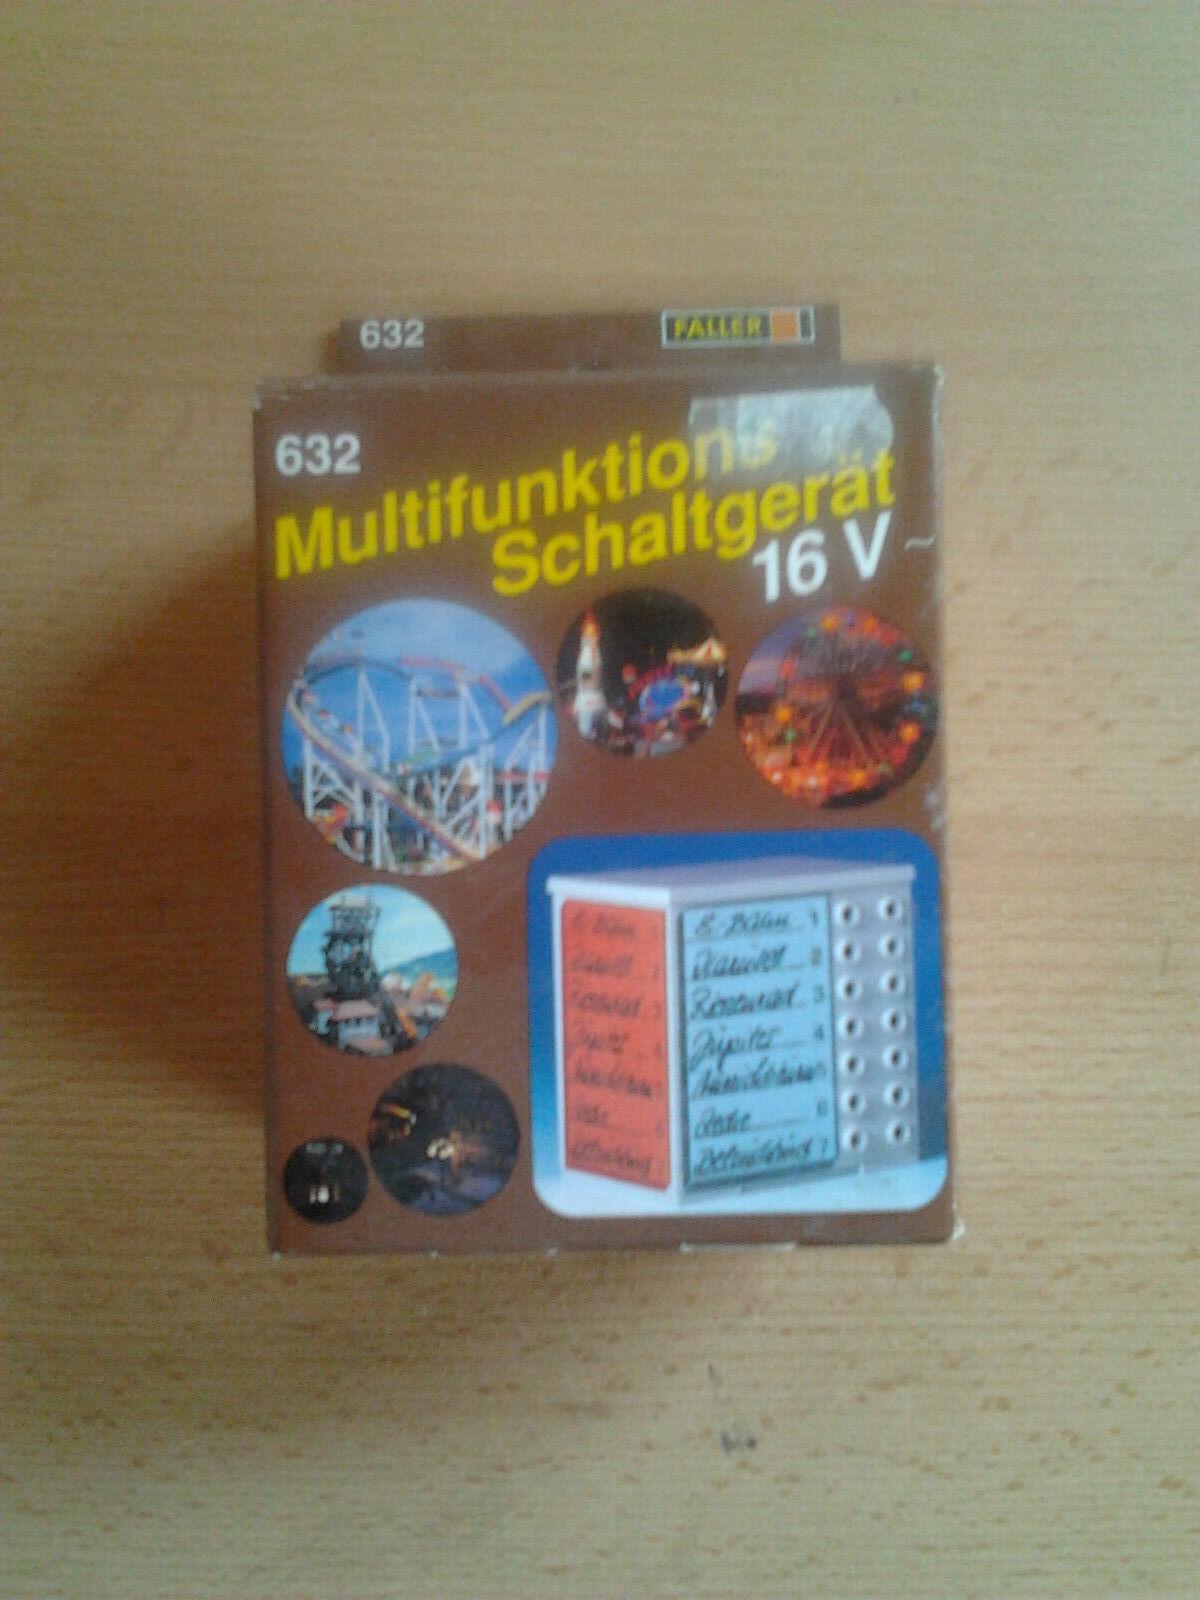 16 V Multifunktionsschaltgerät für die Modell Kirmes